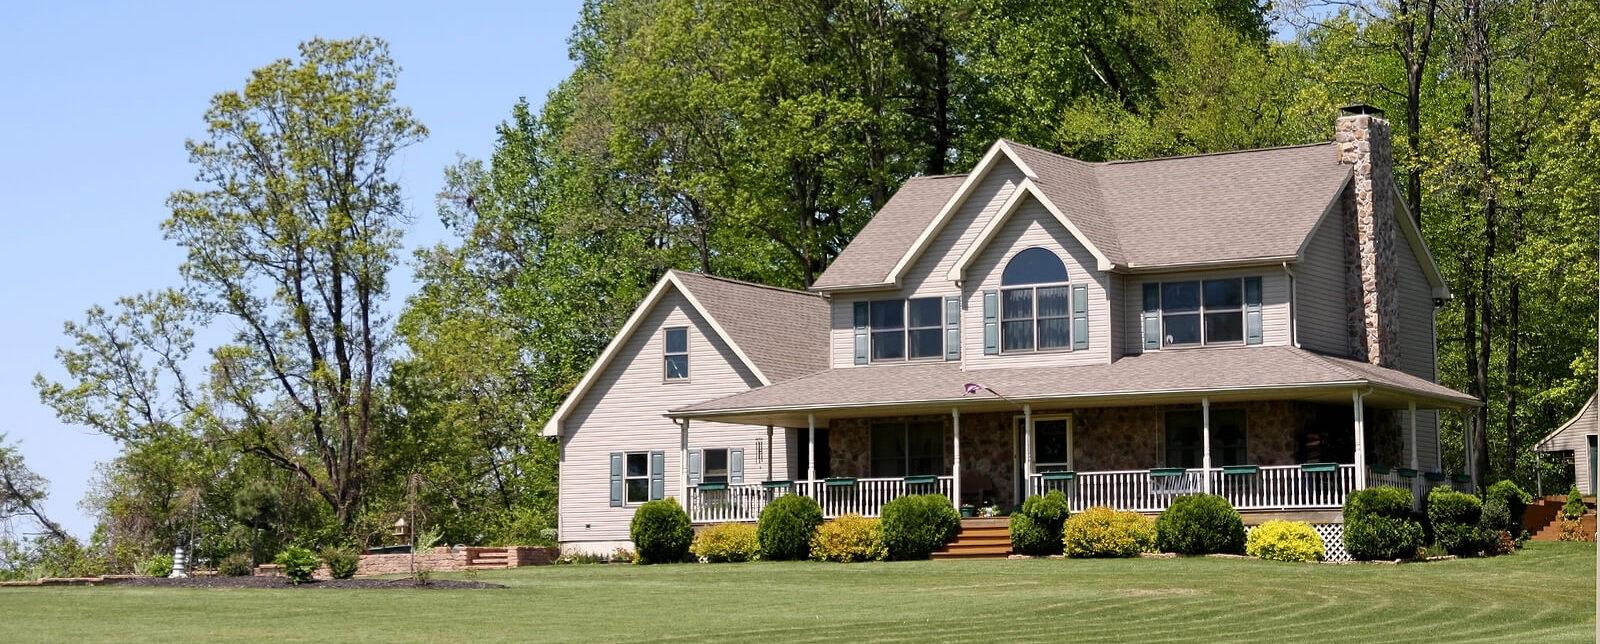 Sharon Grant Shelburne Real Estate Shelburne Homes For Sale